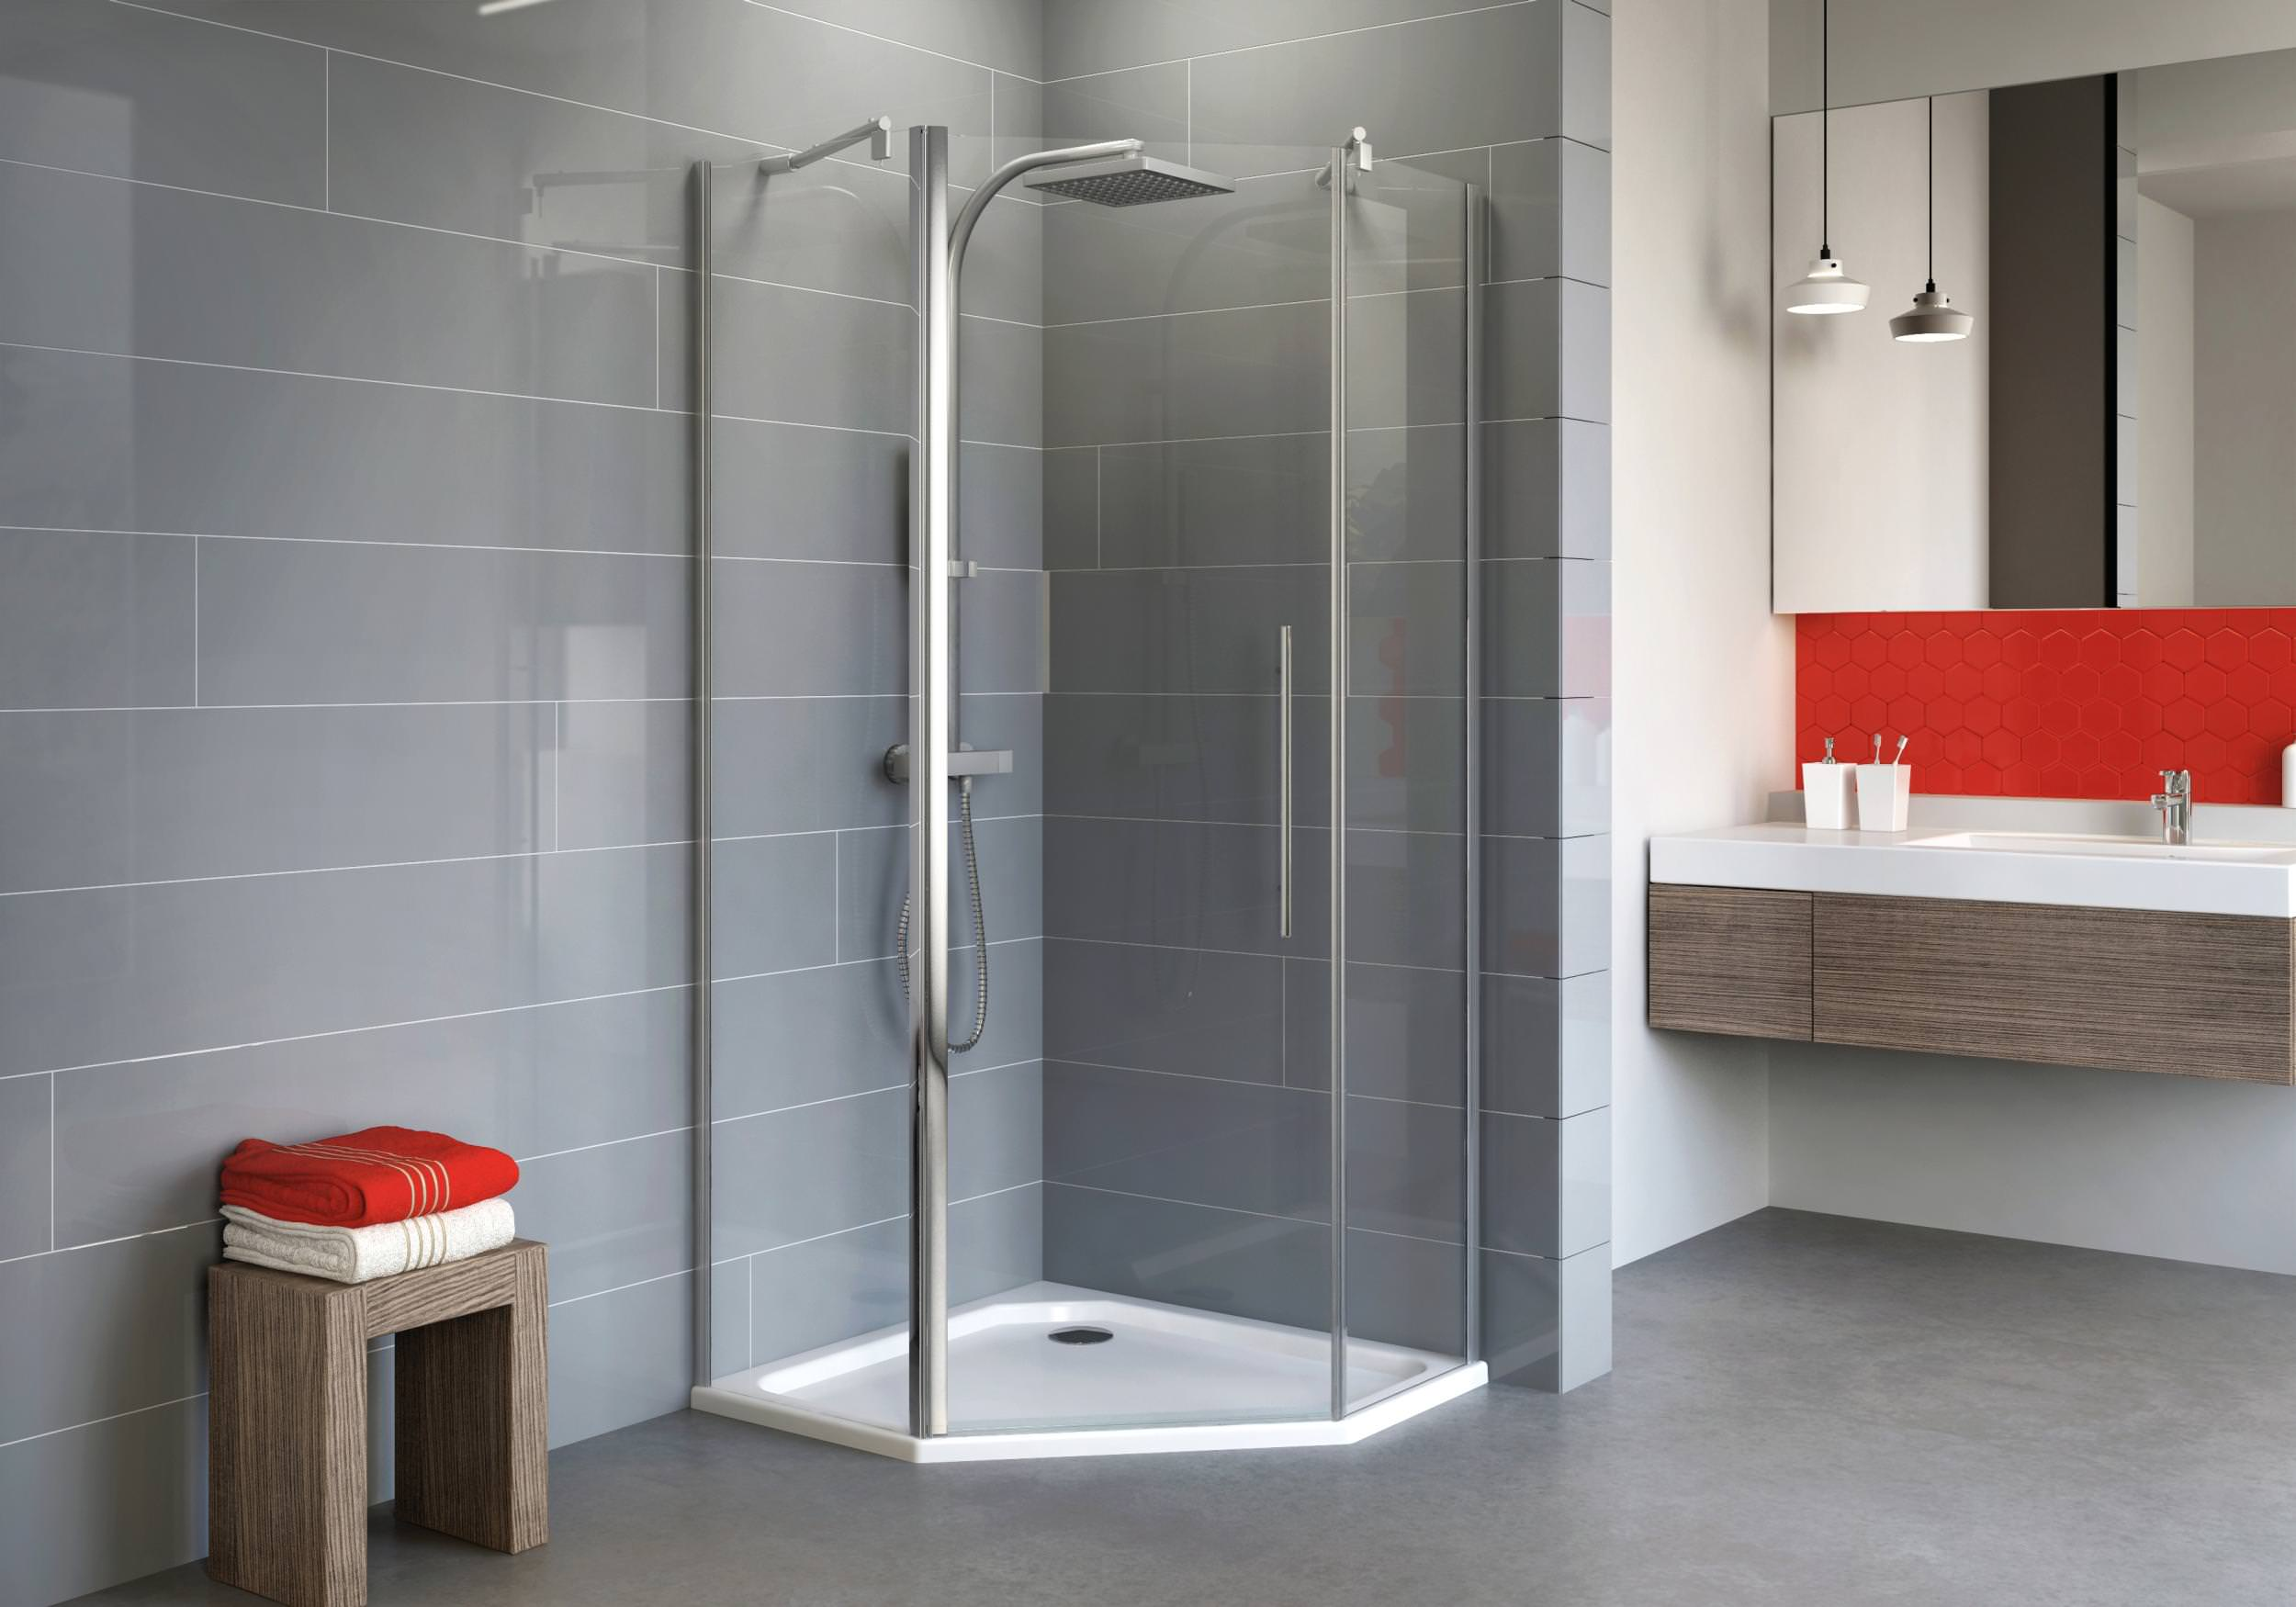 schulte alexa style 2 0 f nfeckdusche mit pendelt r klarglas hell chromoptik 90 x 90 cm 192 cm. Black Bedroom Furniture Sets. Home Design Ideas